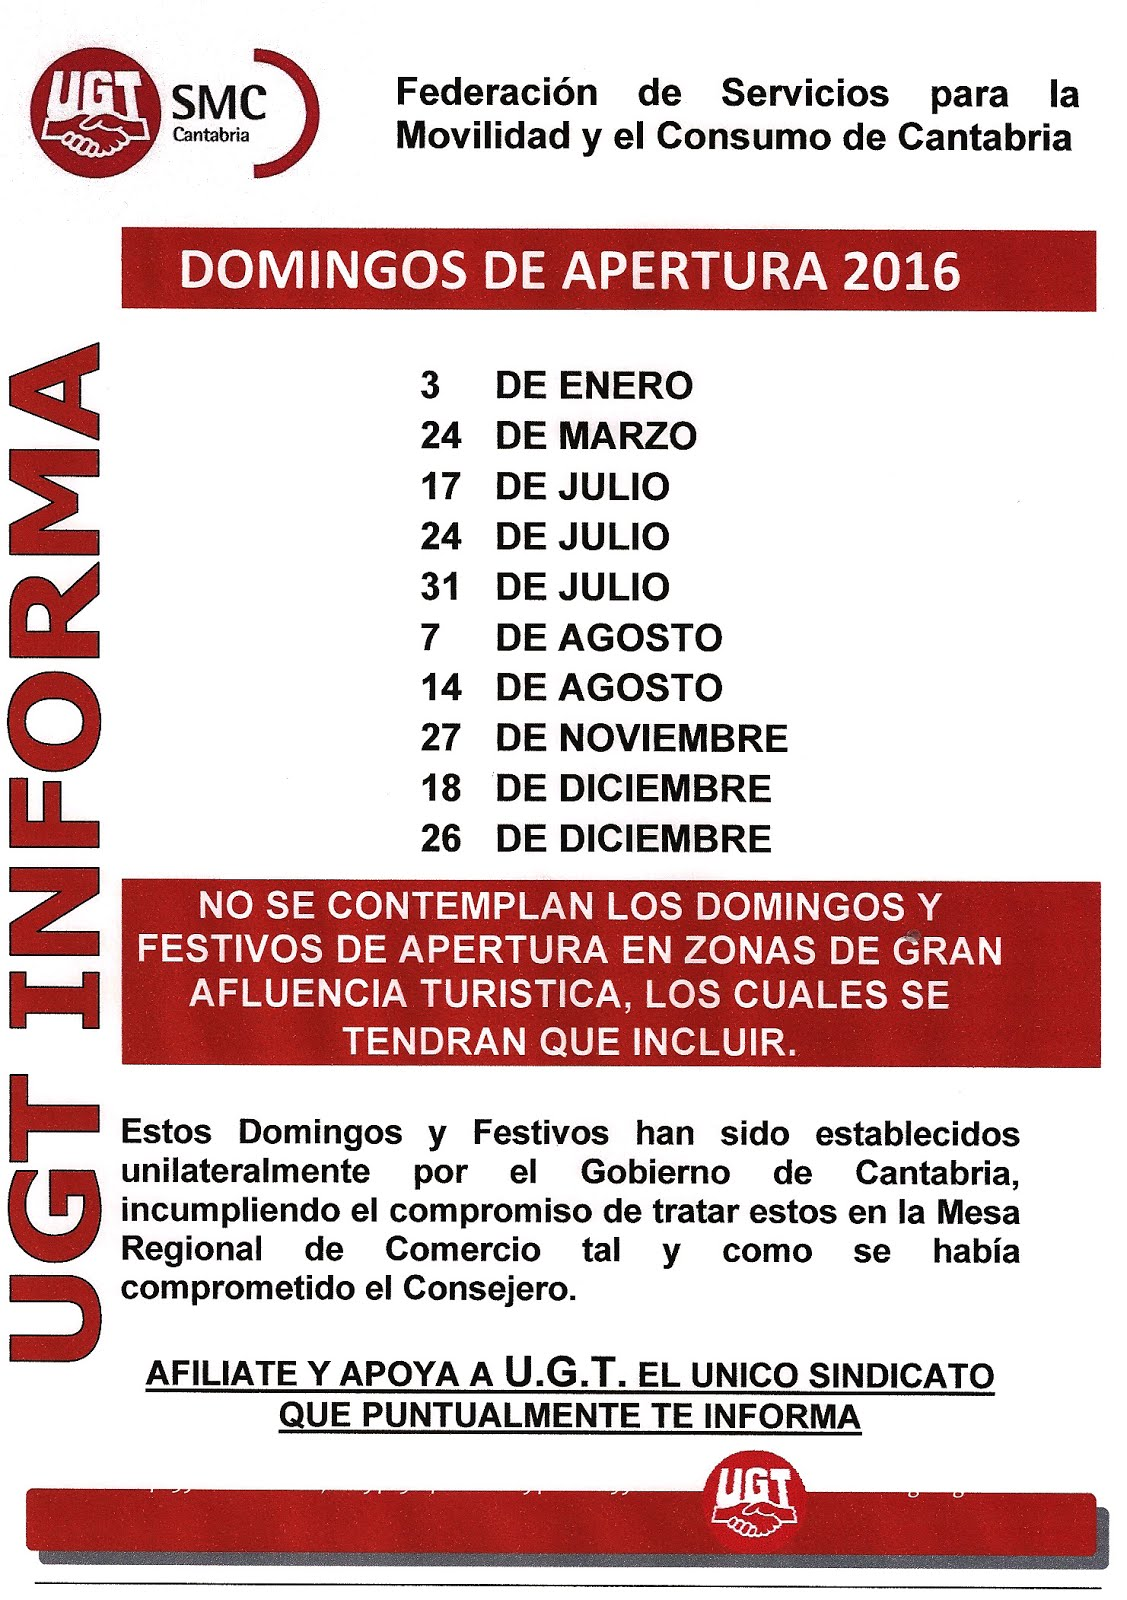 DOMINGOS DE APERTURA 2016